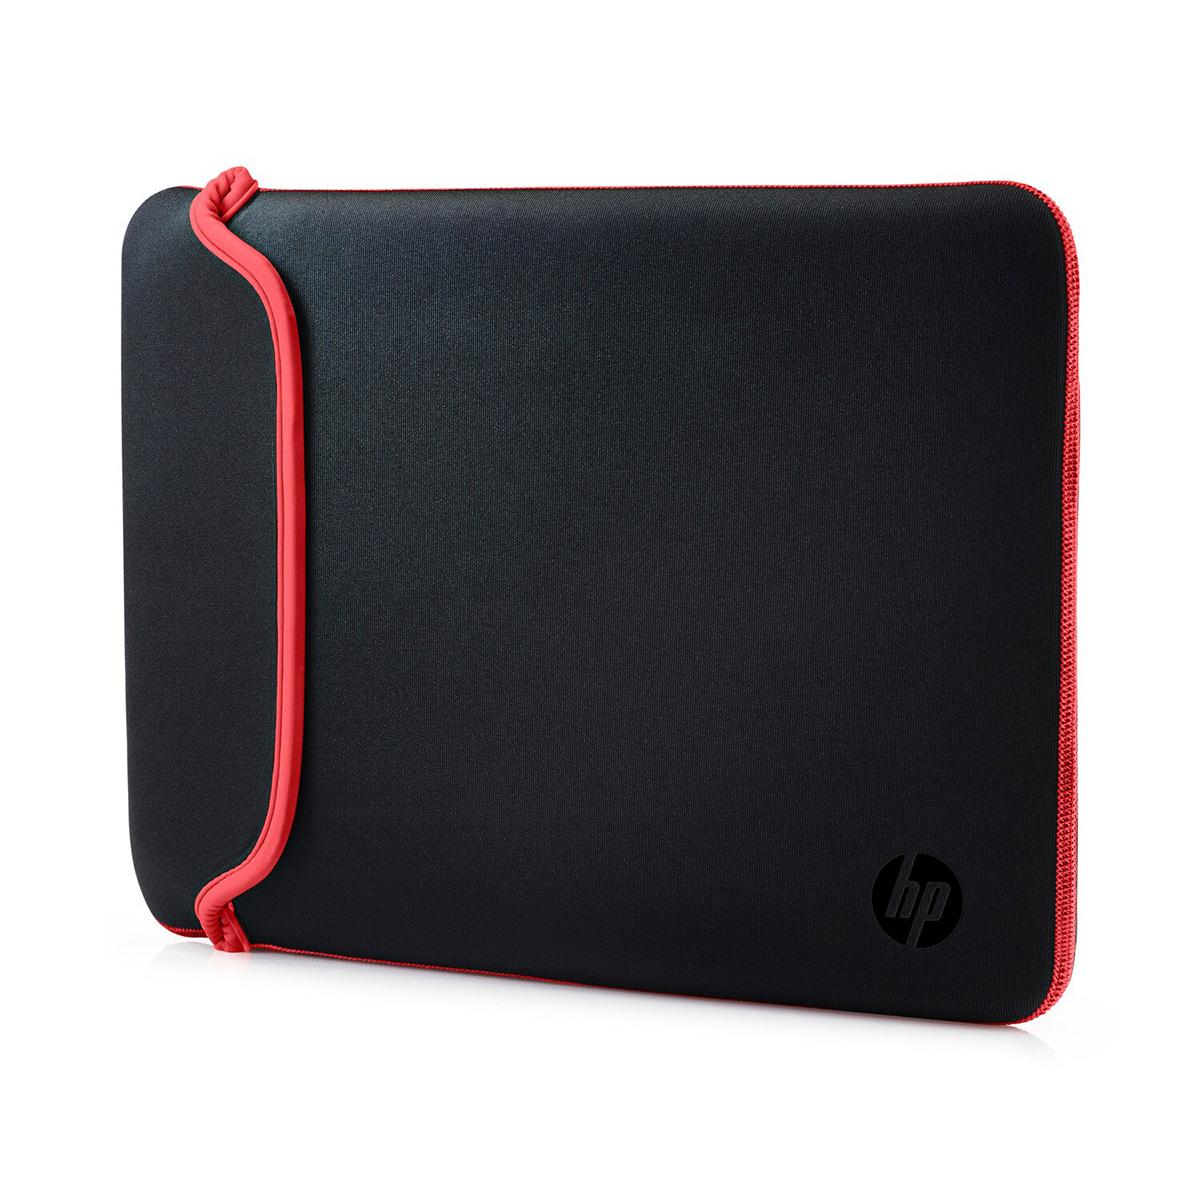 HP 15.6 Black Red Chroma Sleeve